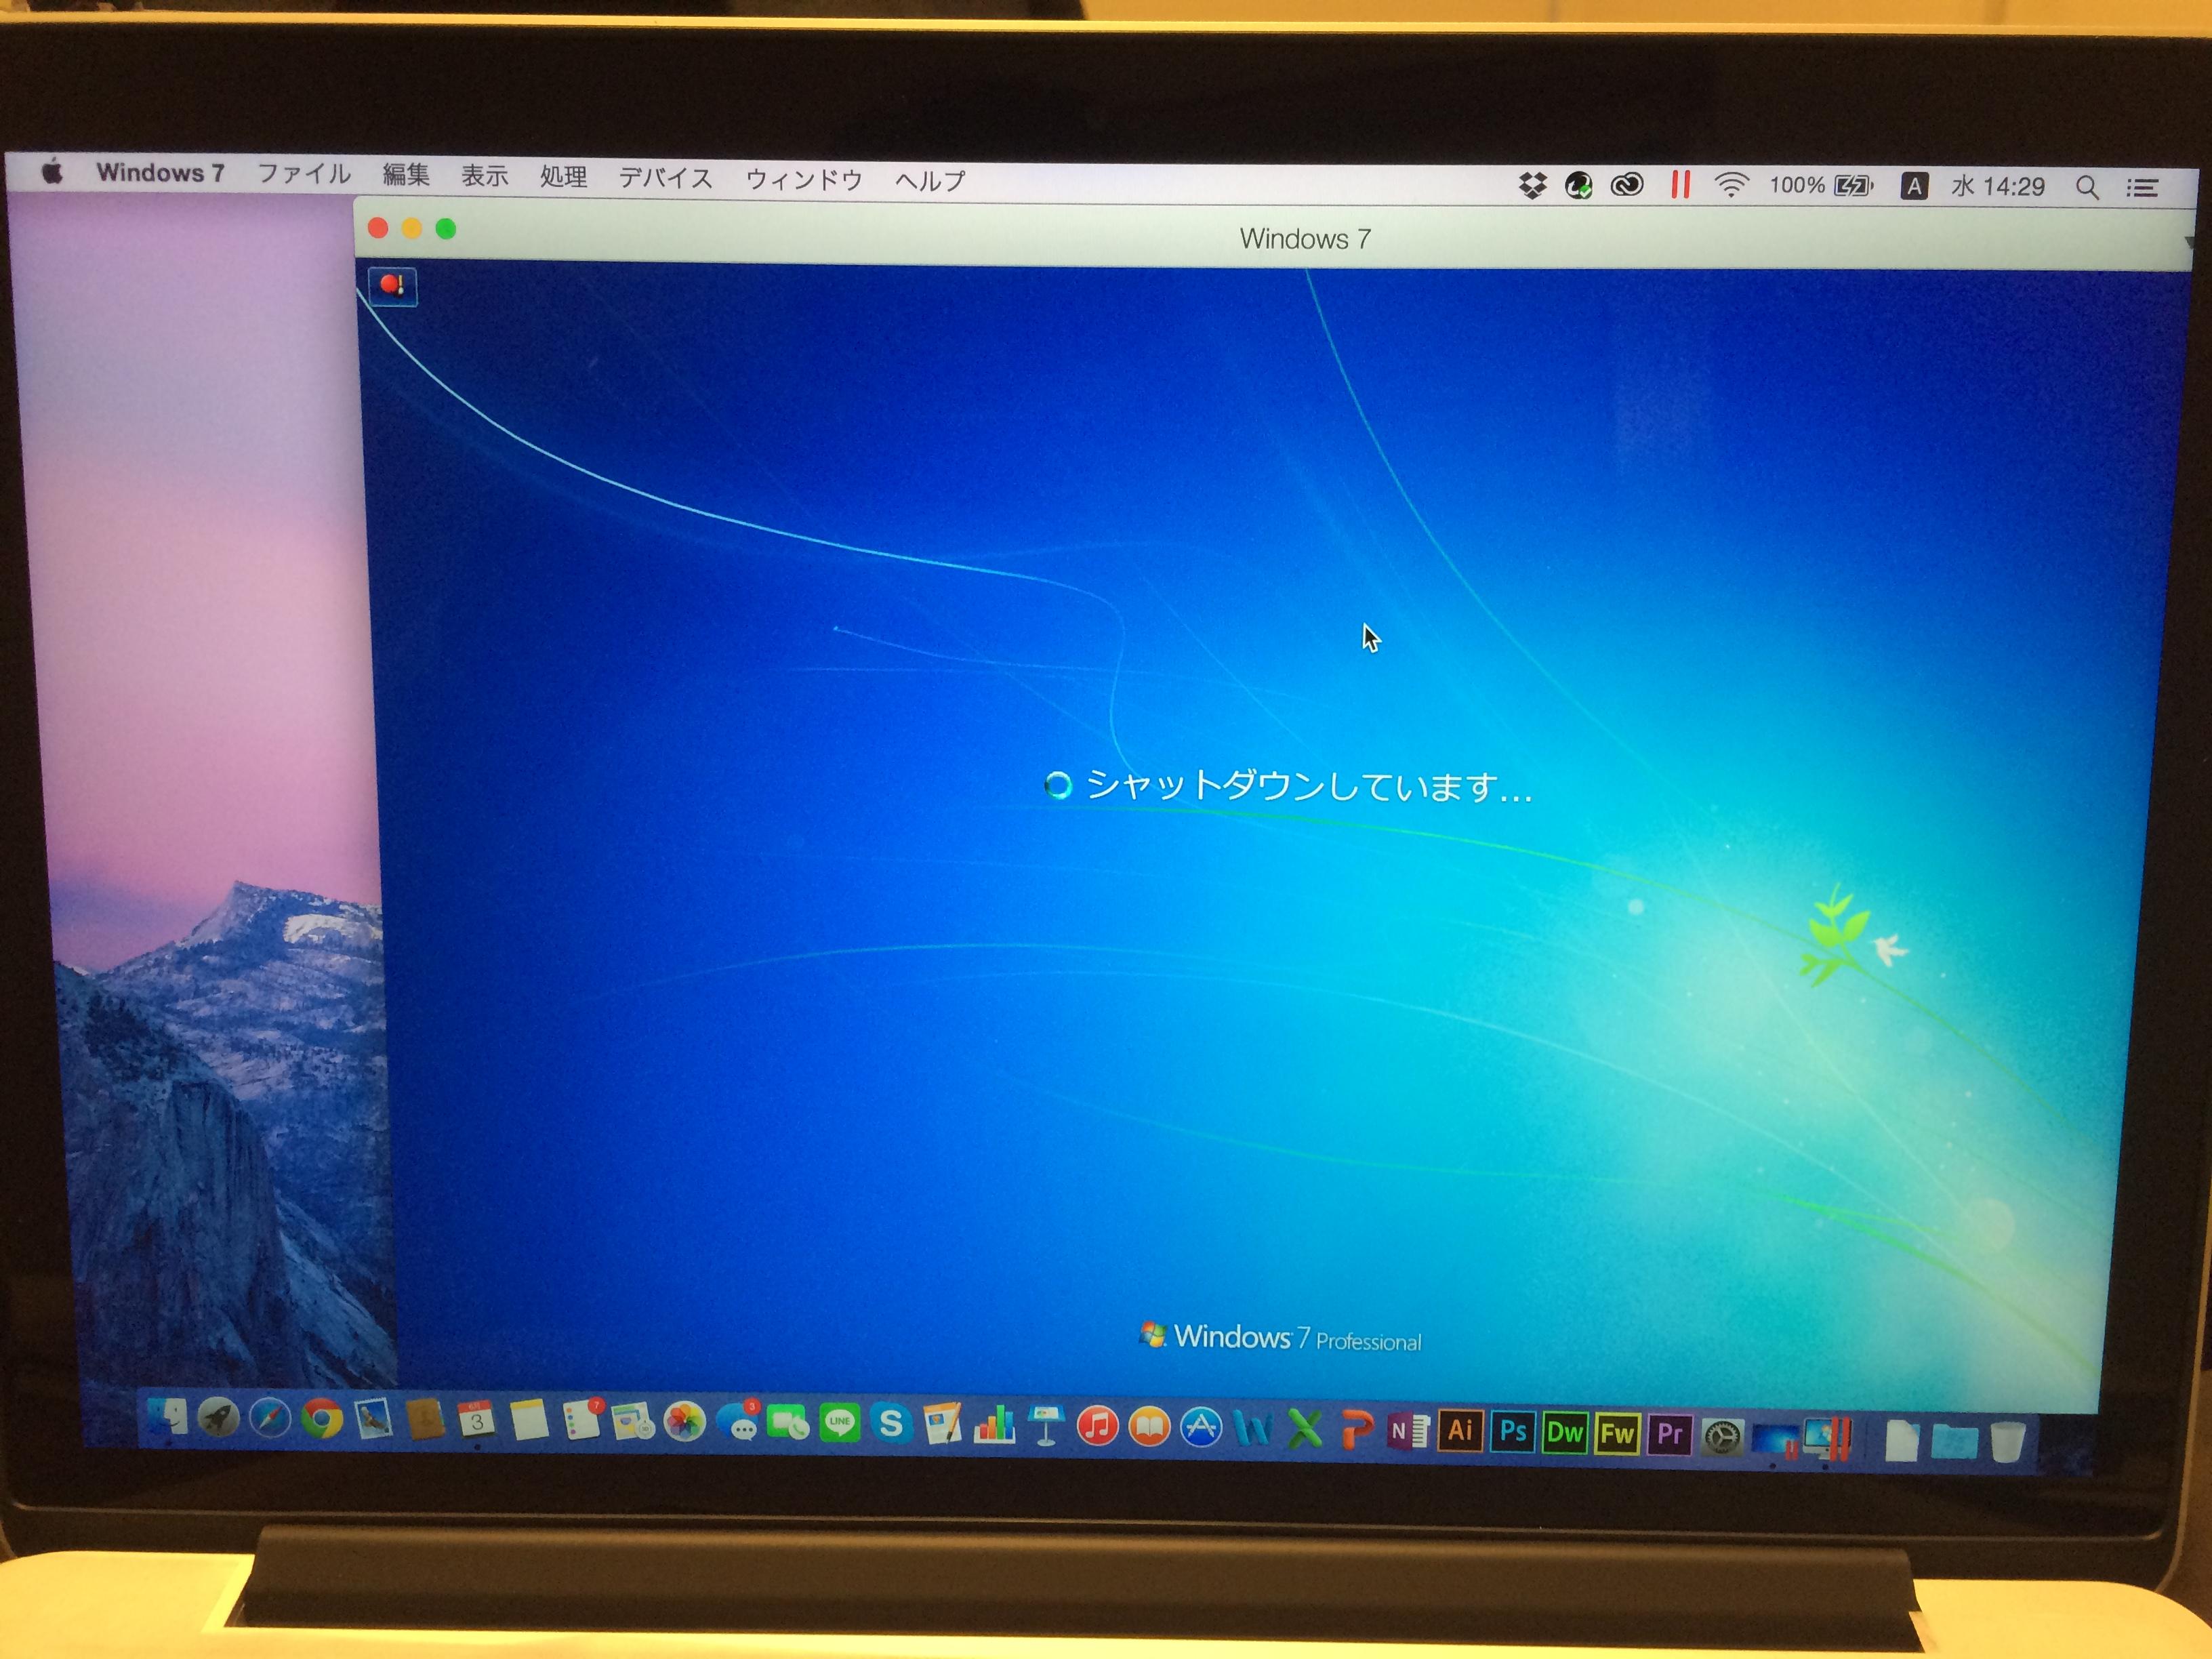 MacBook Pro RetinaディスプレイにParallels DesktopにWindows7を入れた